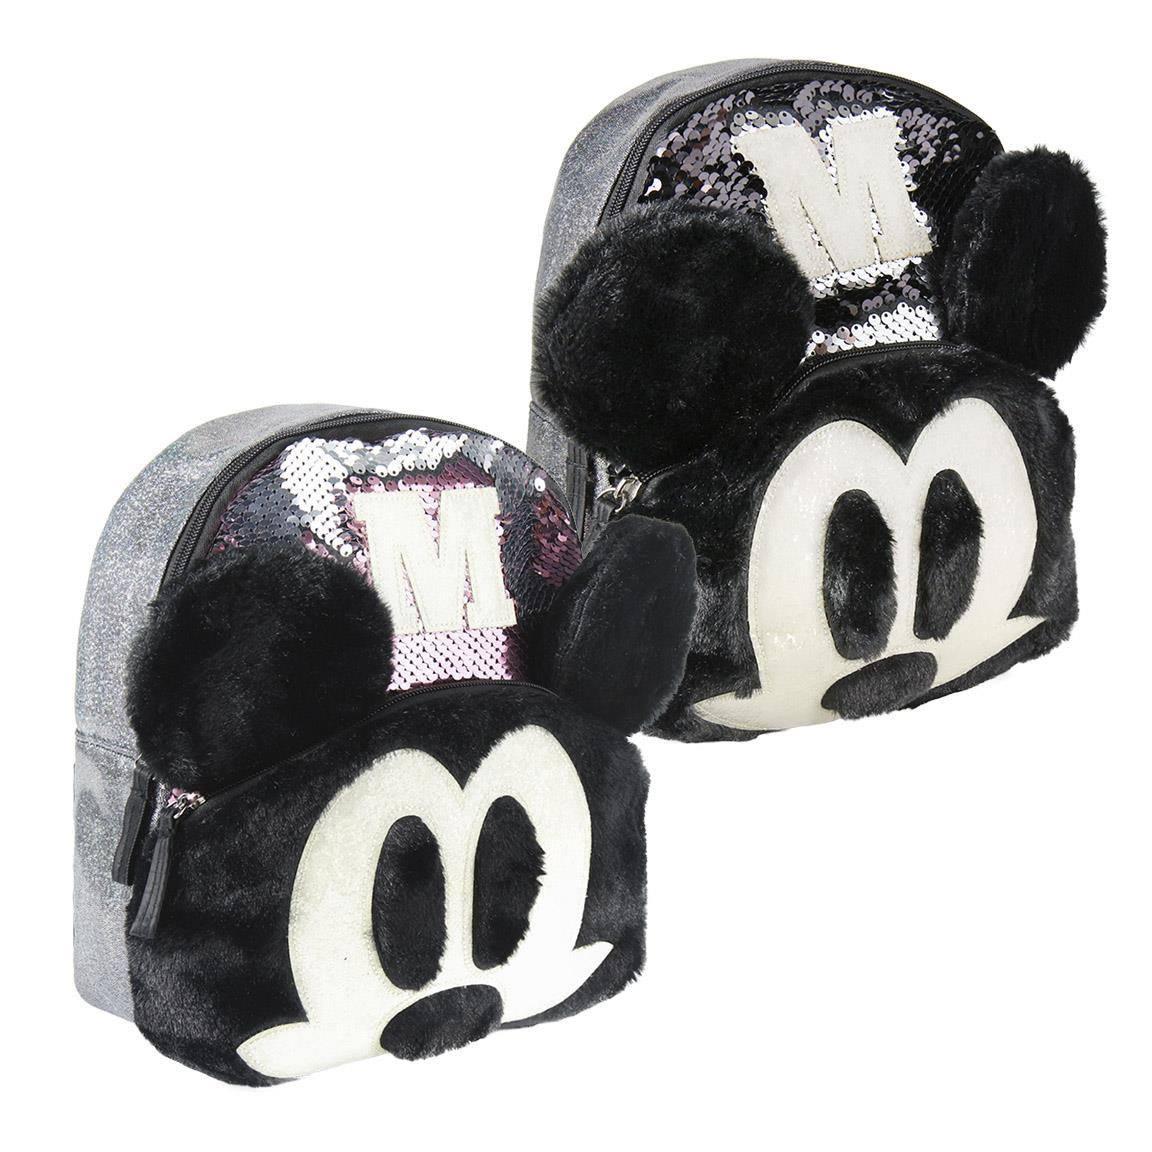 Disney Casual Fashion Backpacks Mickey 21 x 26 x 10 cm Assortment (2)